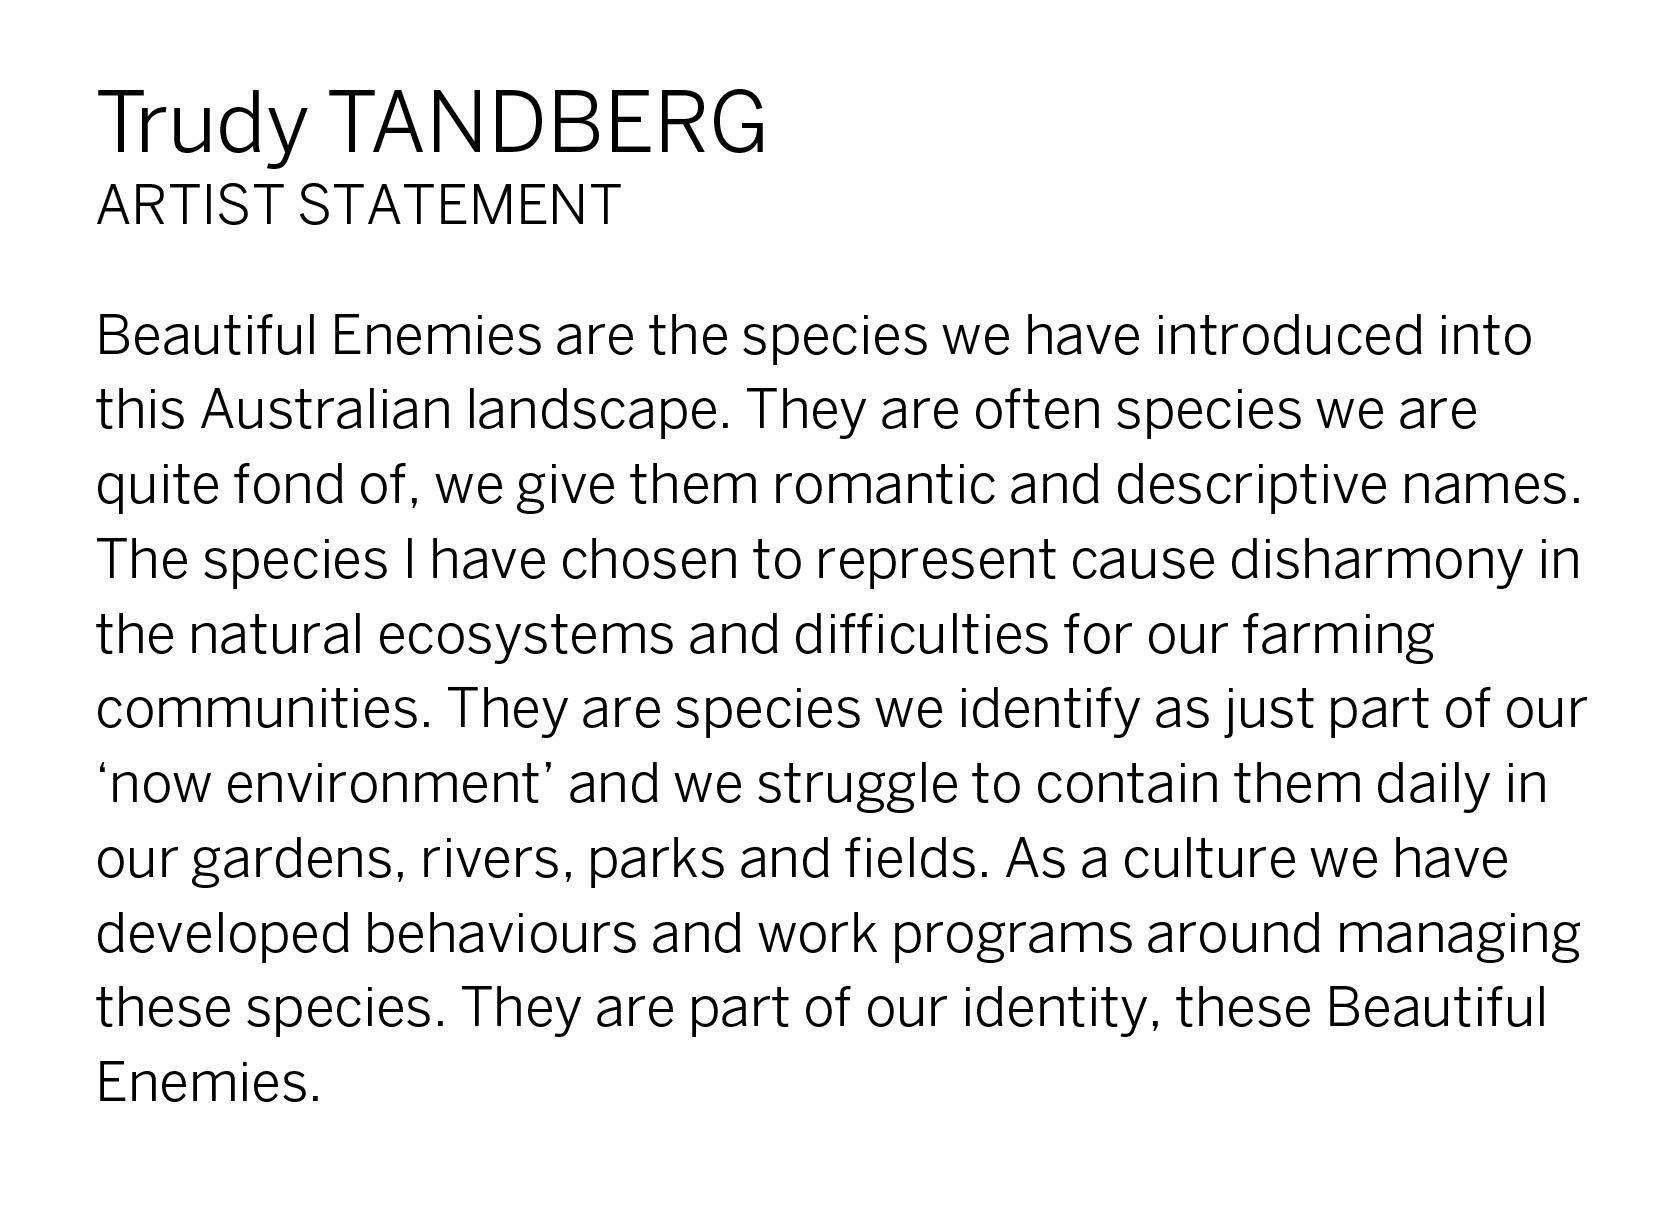 Trudy Tandberg Artist Statement